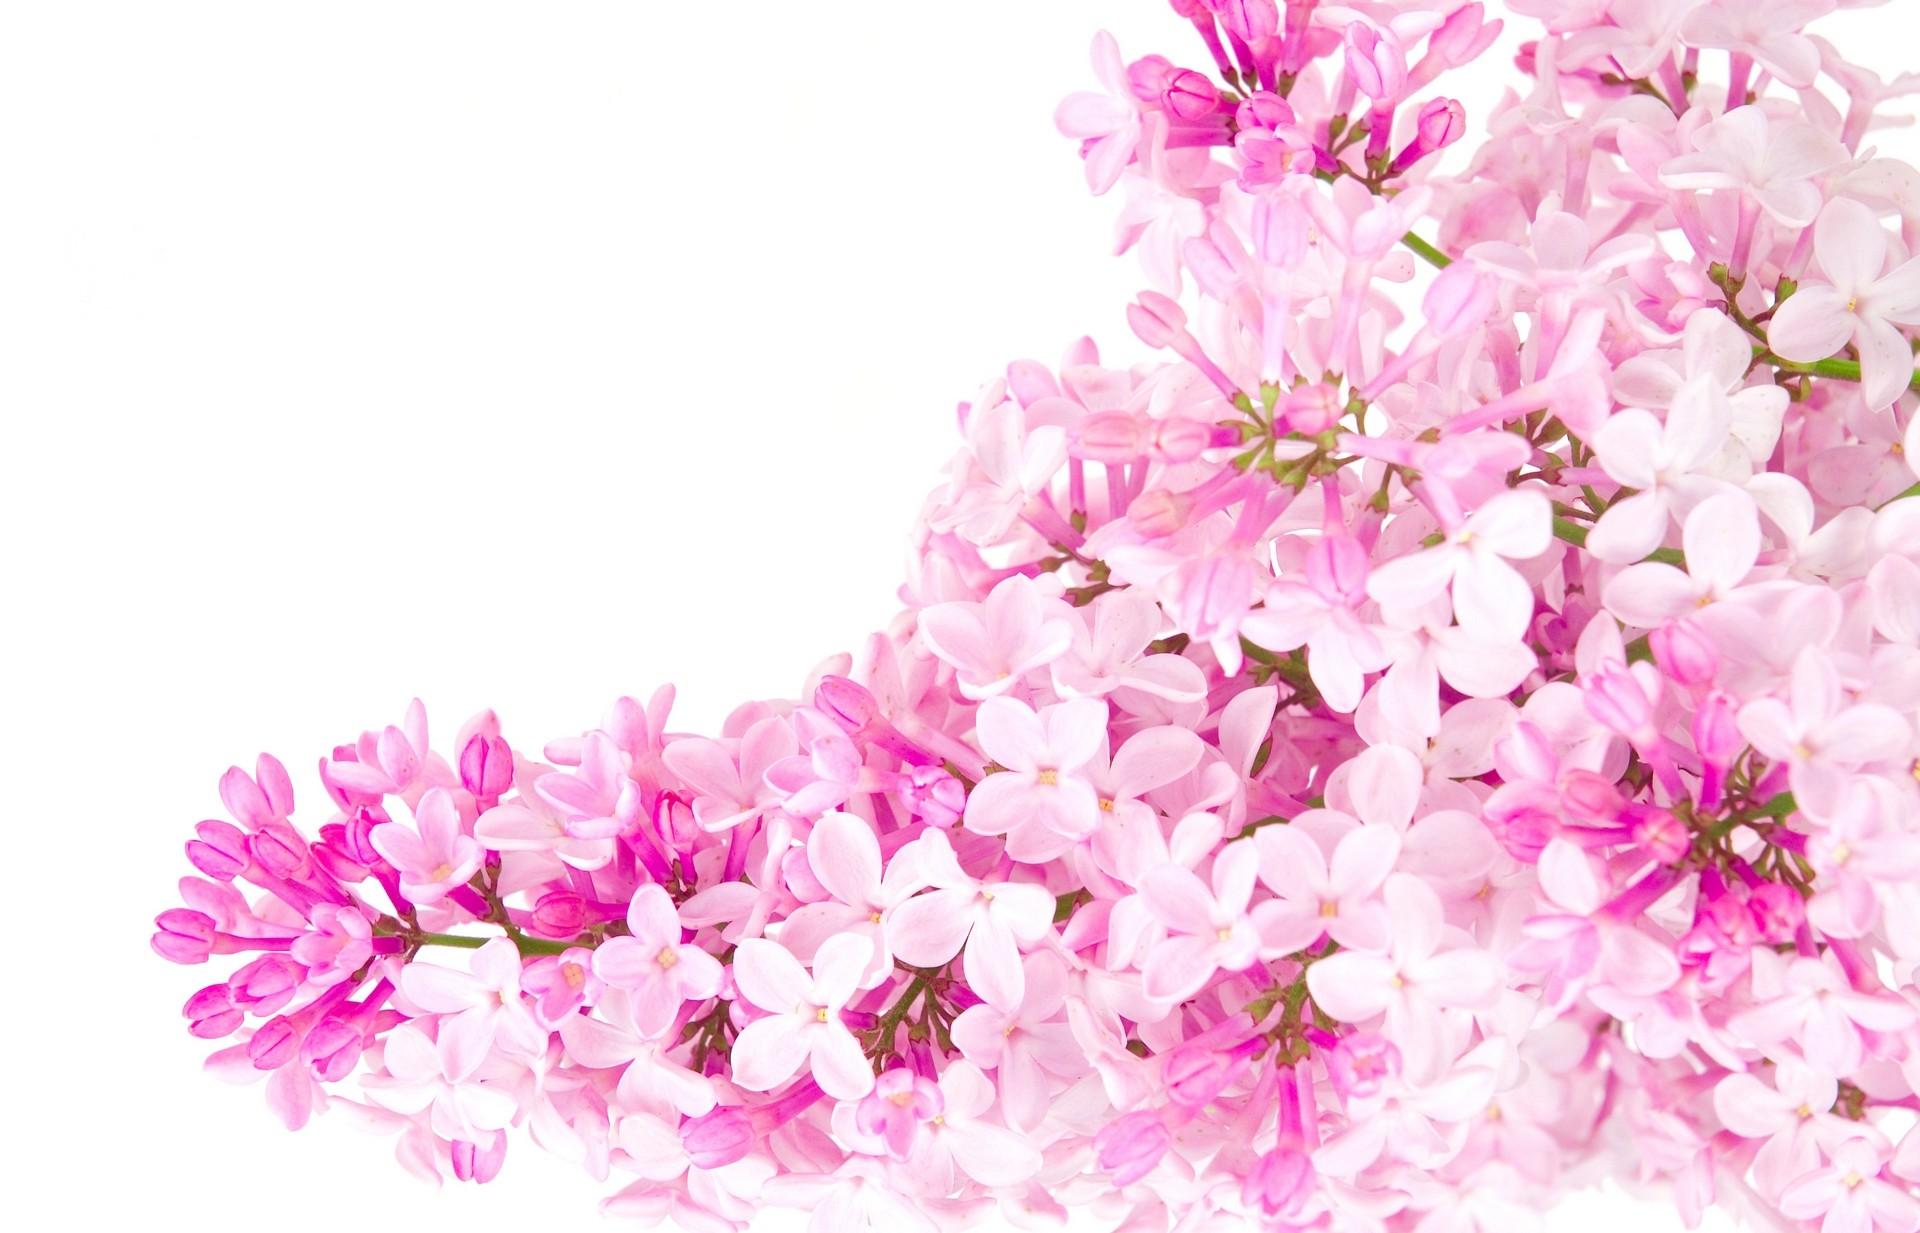 Pink Flowers Color Photo 23830799 Fanpop